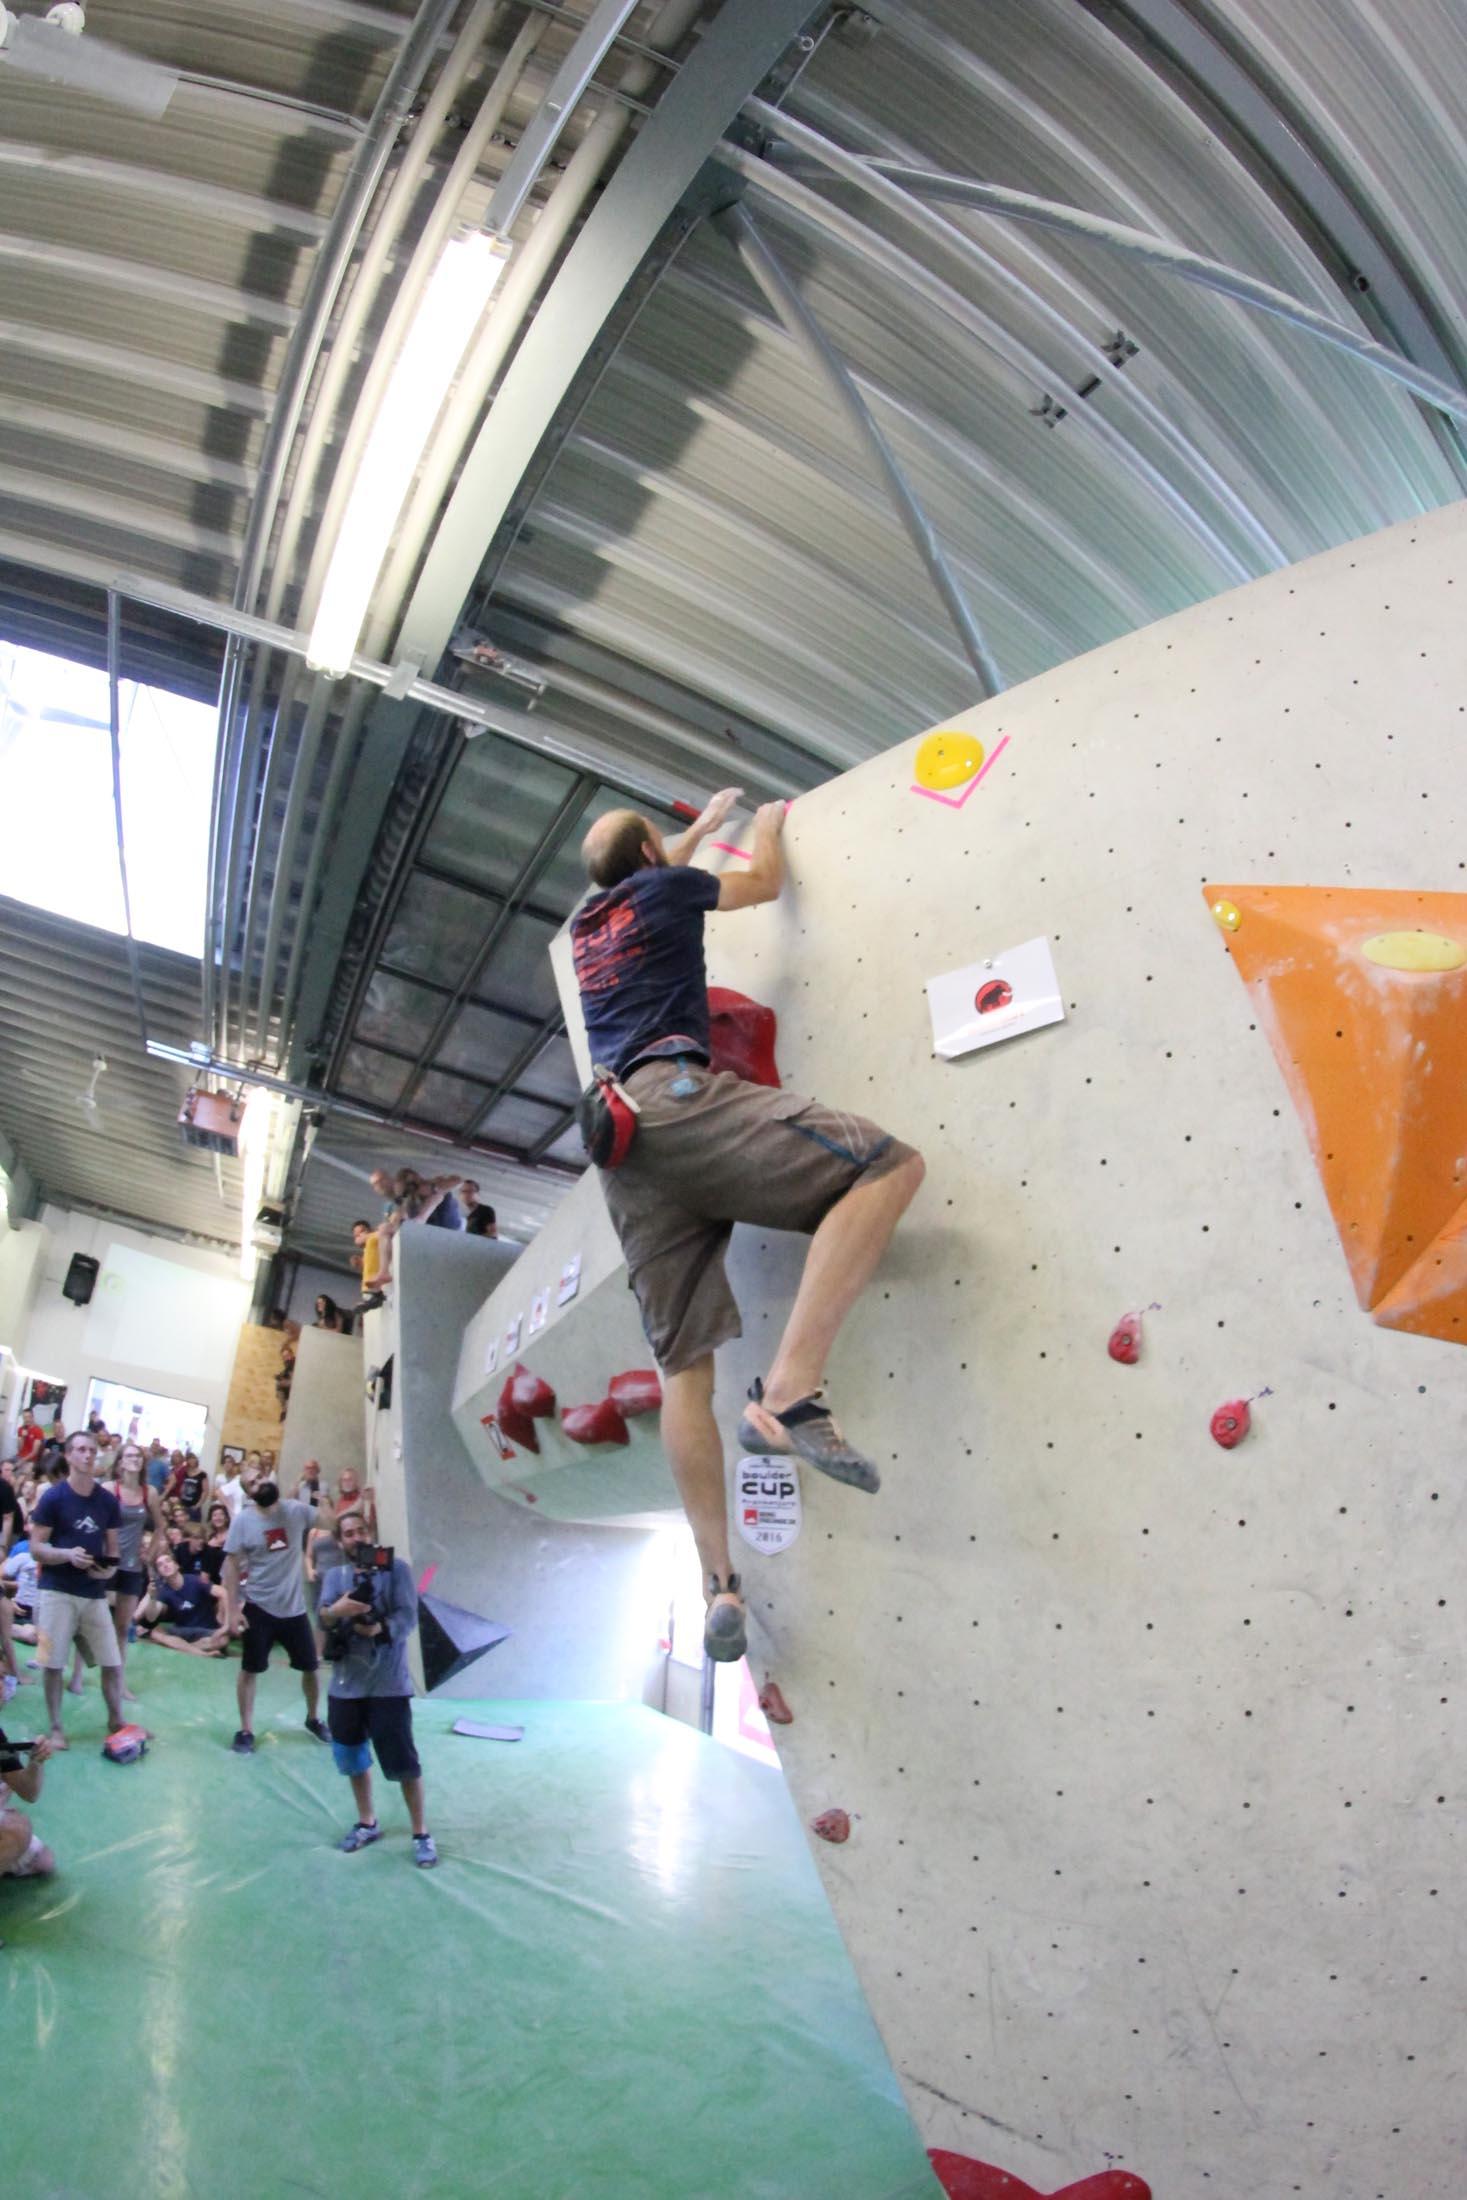 Finale, internationaler bouldercup Frankenjura 2016, BLOCKHELDEN Erlangen, Mammut, Bergfreunde.de, Boulderwettkampf07092016604